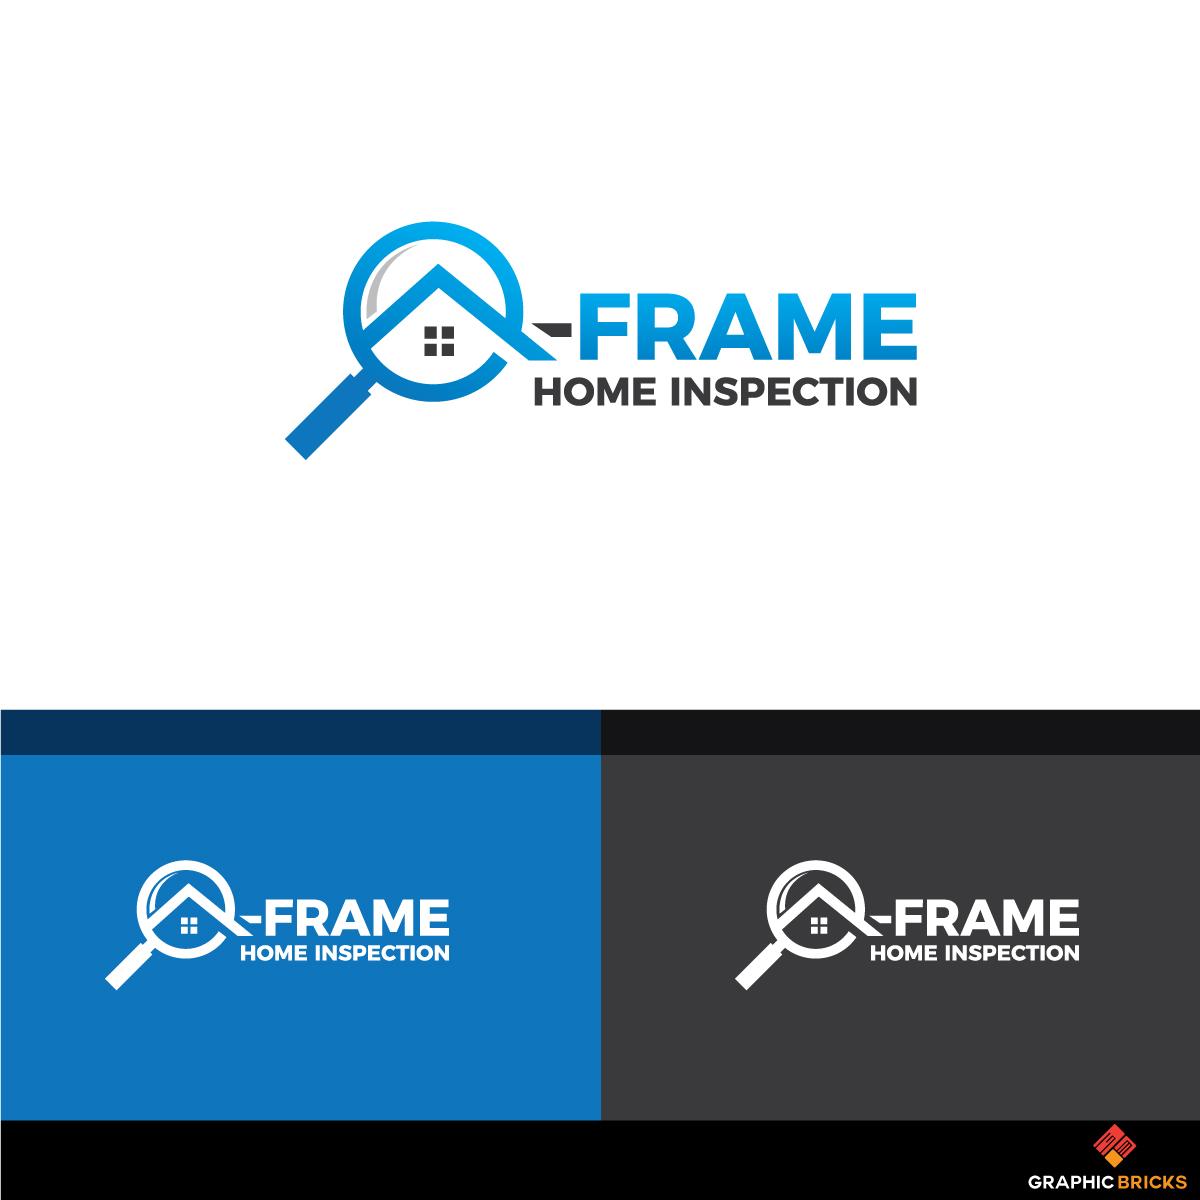 Modern Conservative Home Inspection Logo Design For A